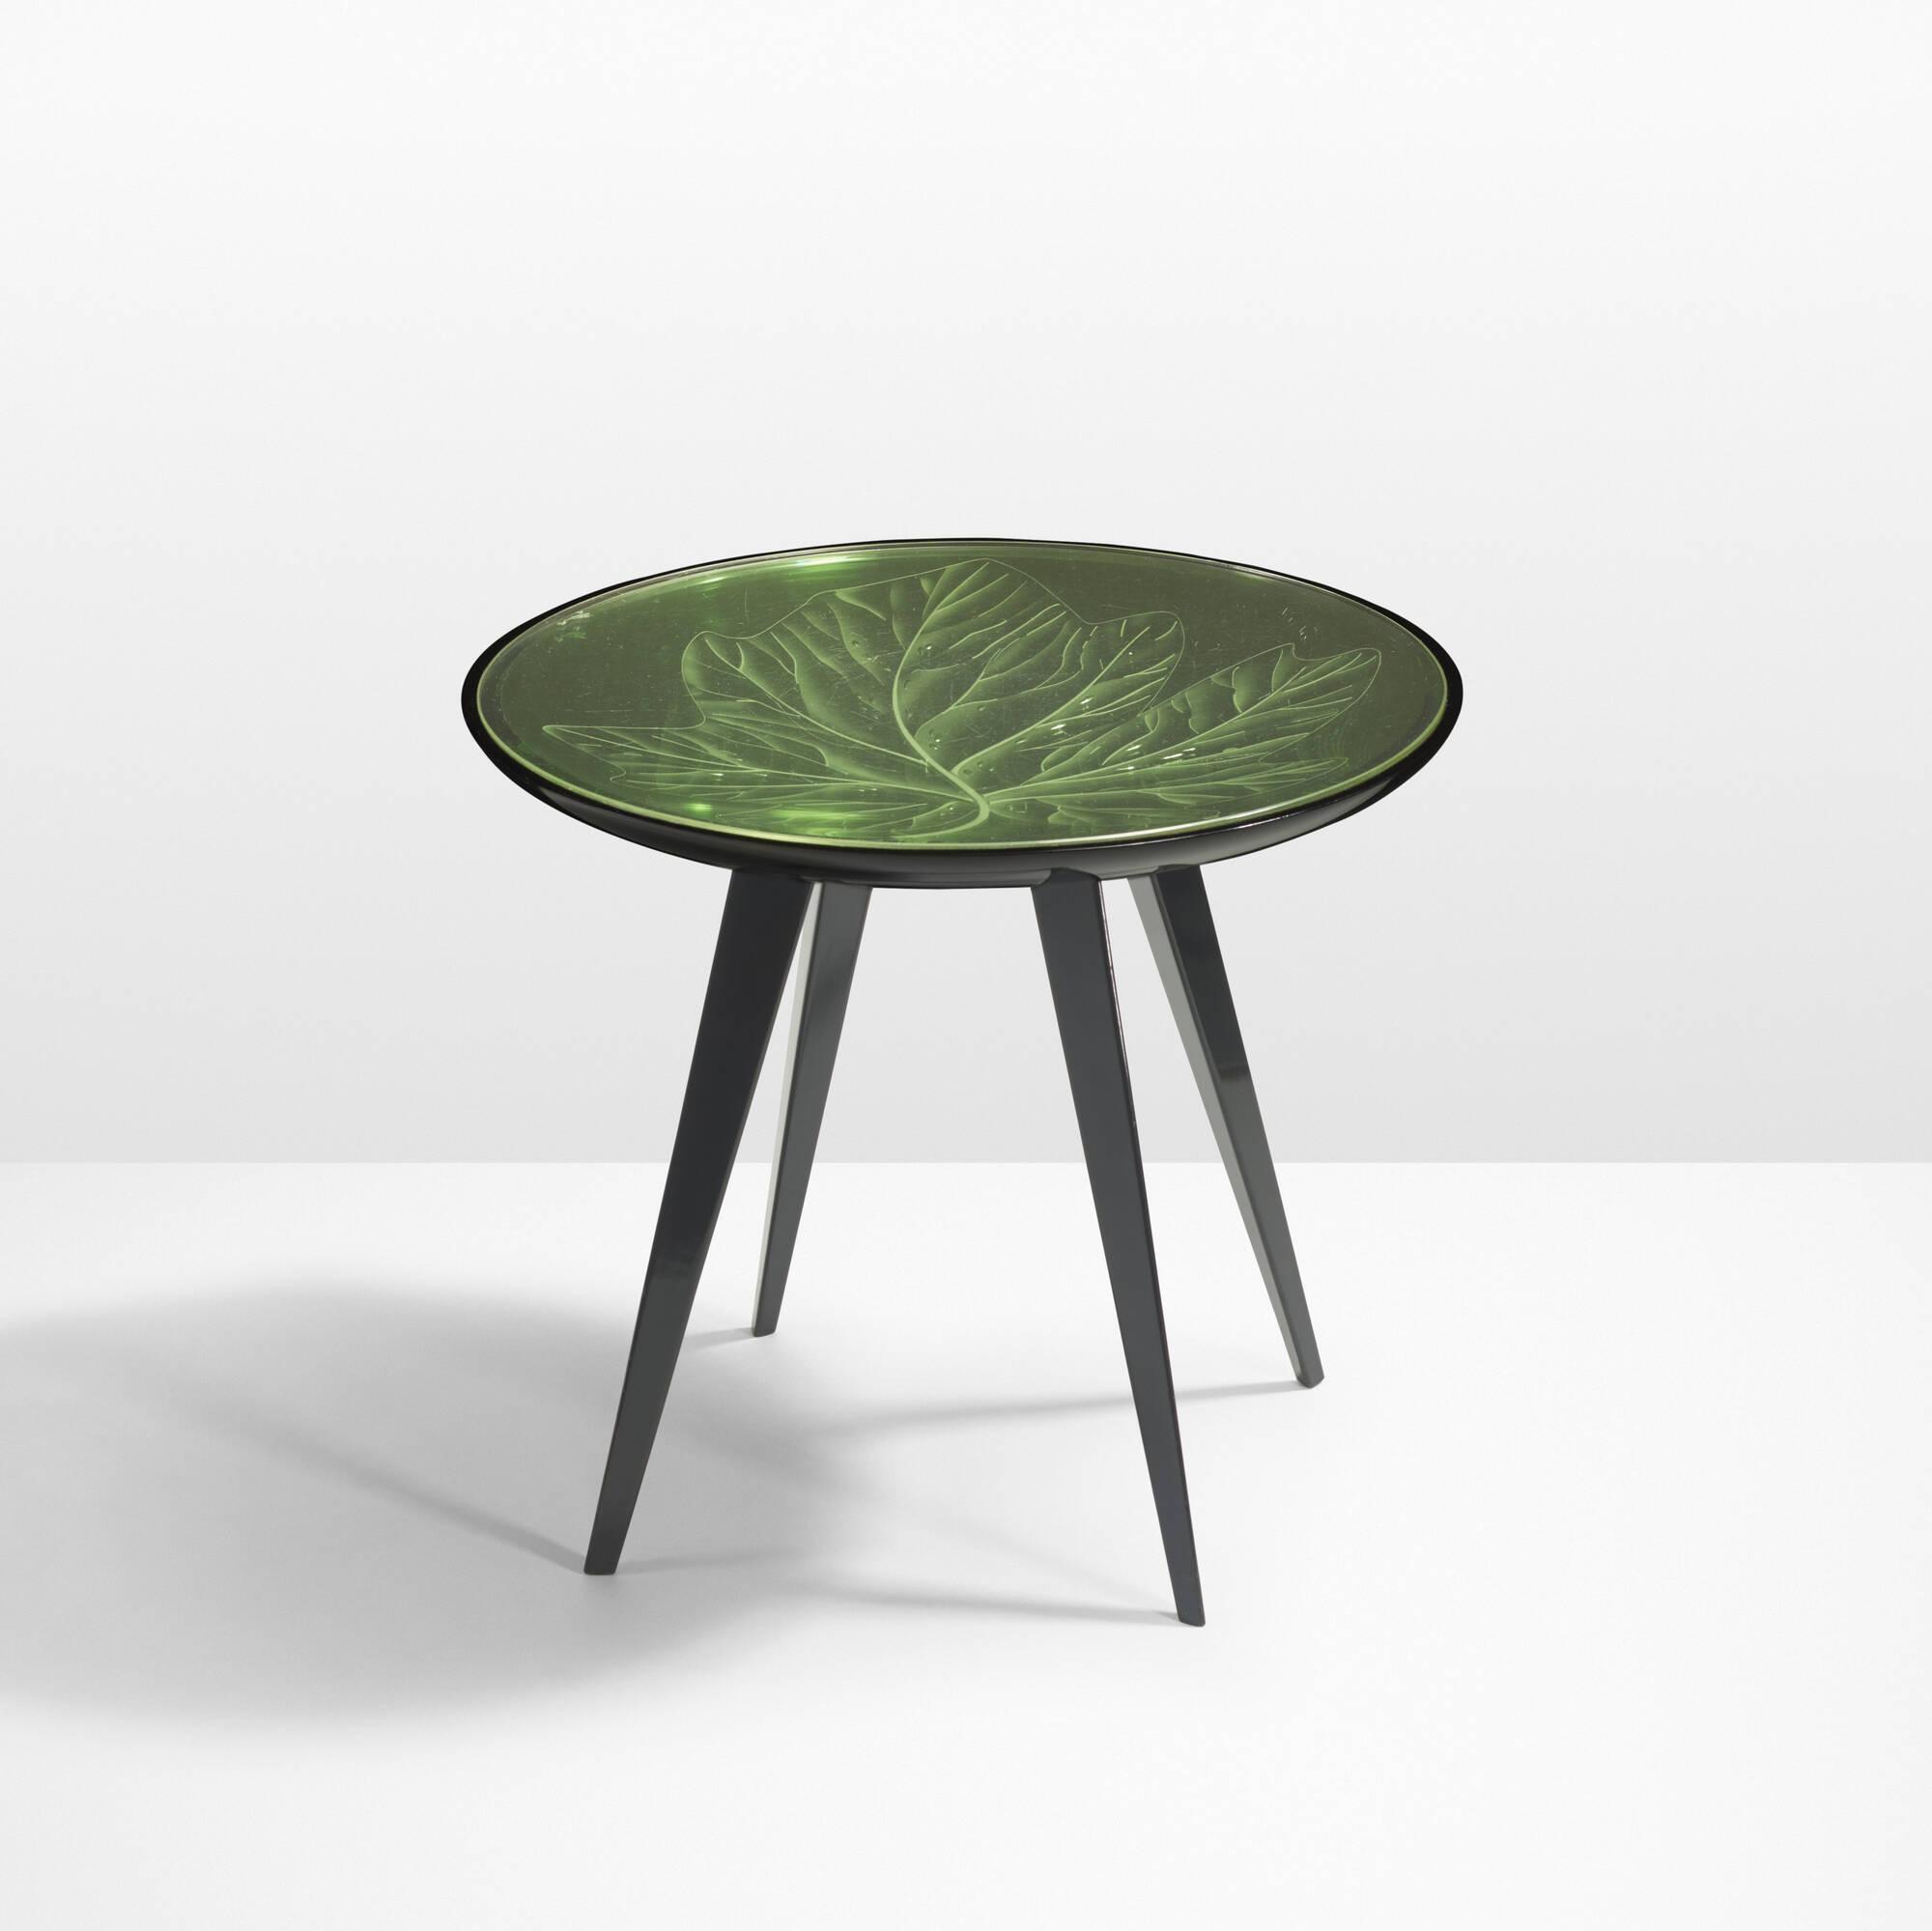 24: Pietro Chiesa / Rare occasional table (1 of 2)